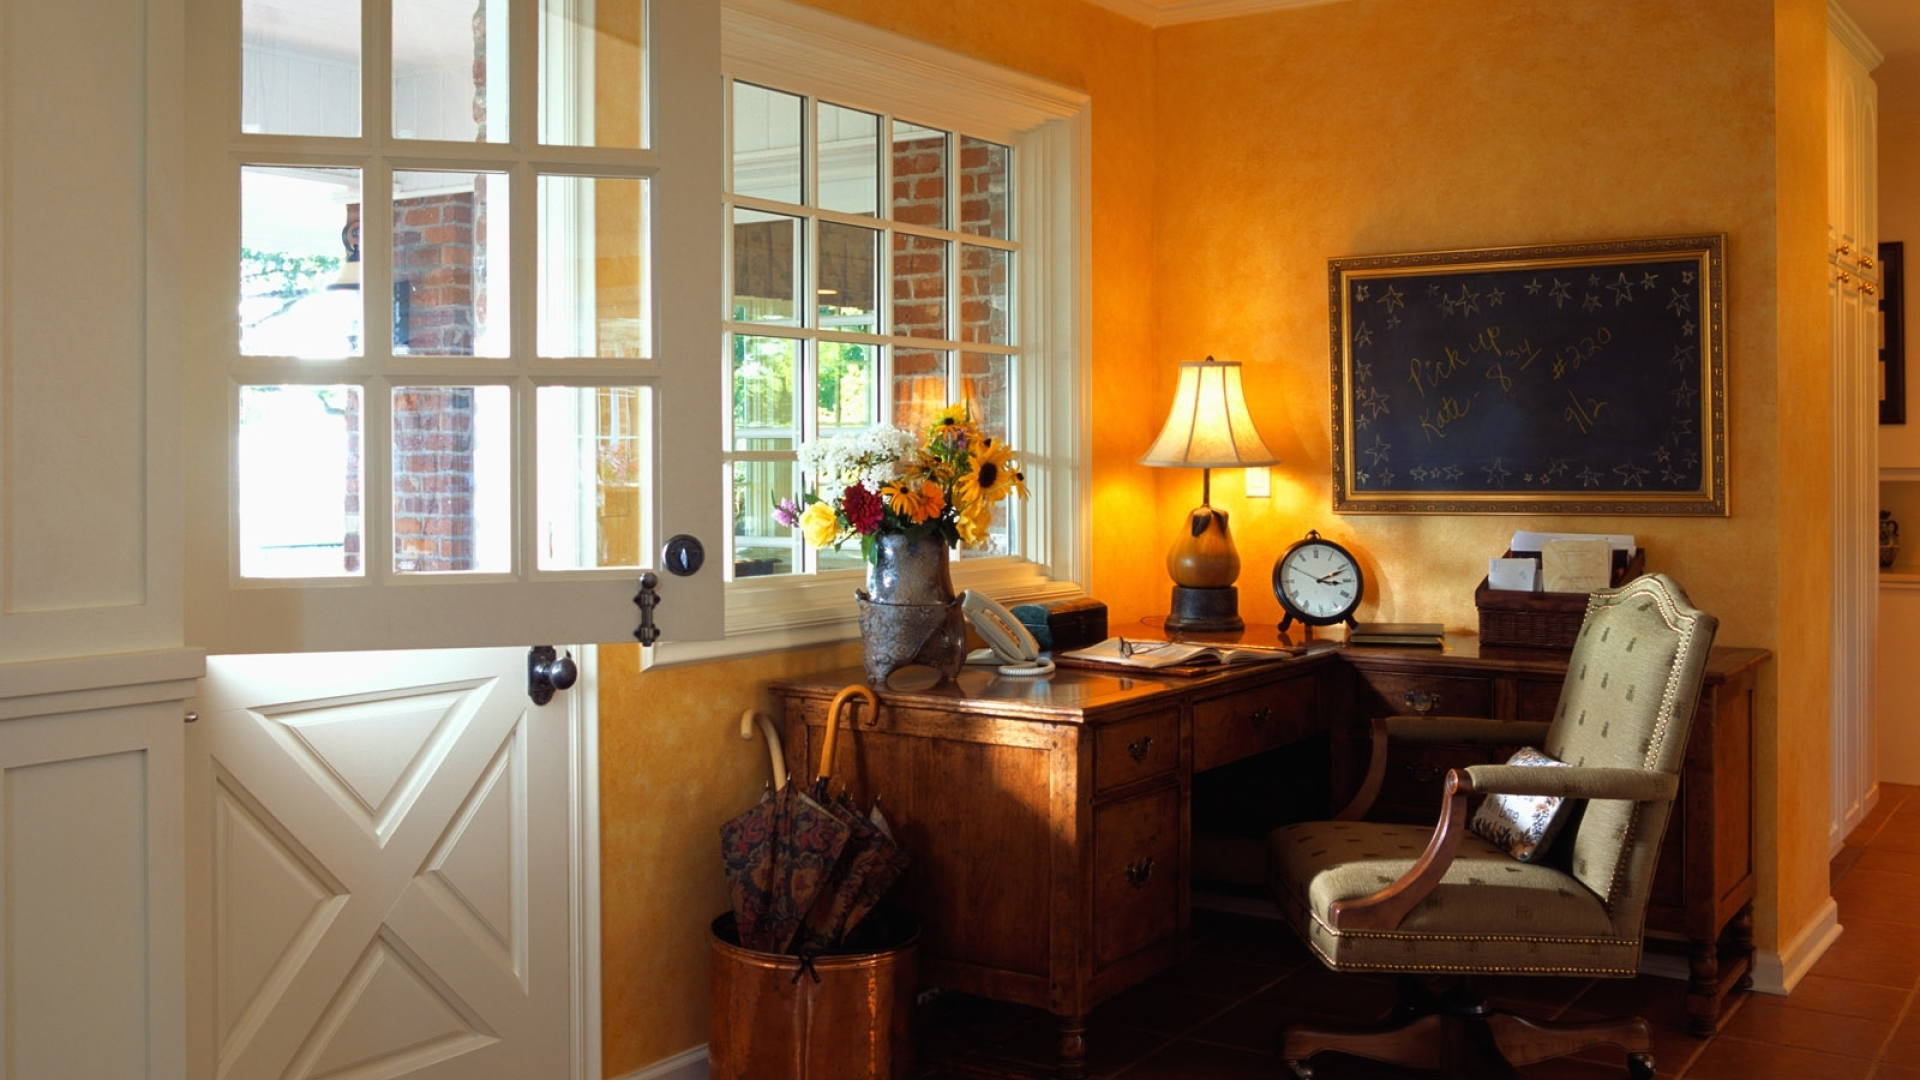 1920x1080 Room Office Chair 1080p Laptop Full Hd Wallpaper Hd